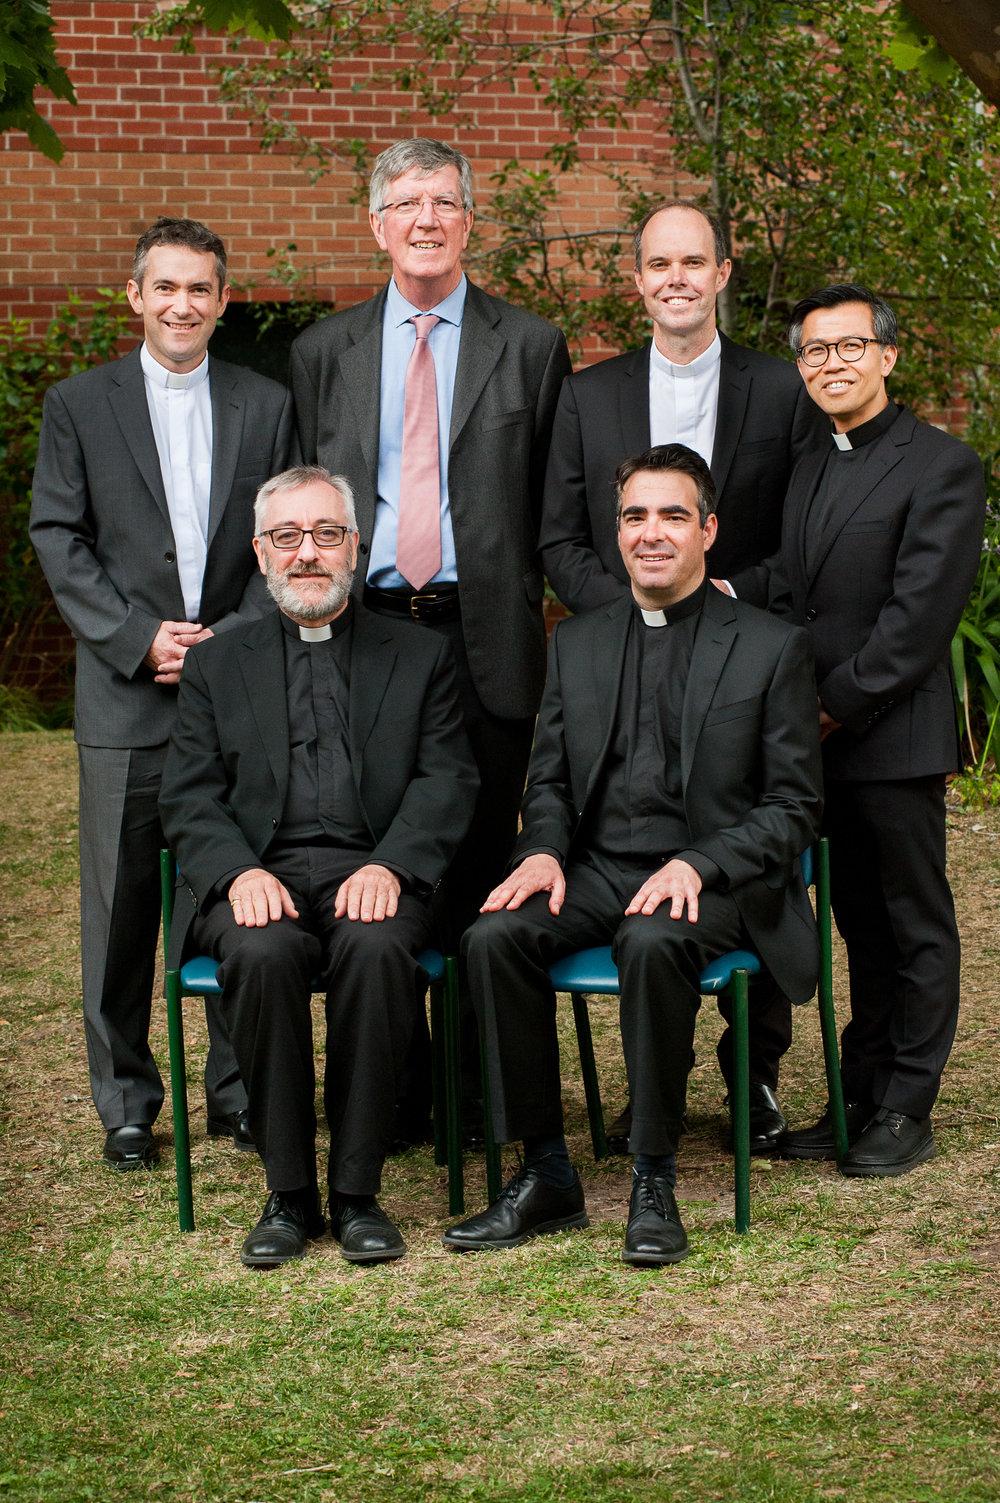 Staff Photo 2.jpg